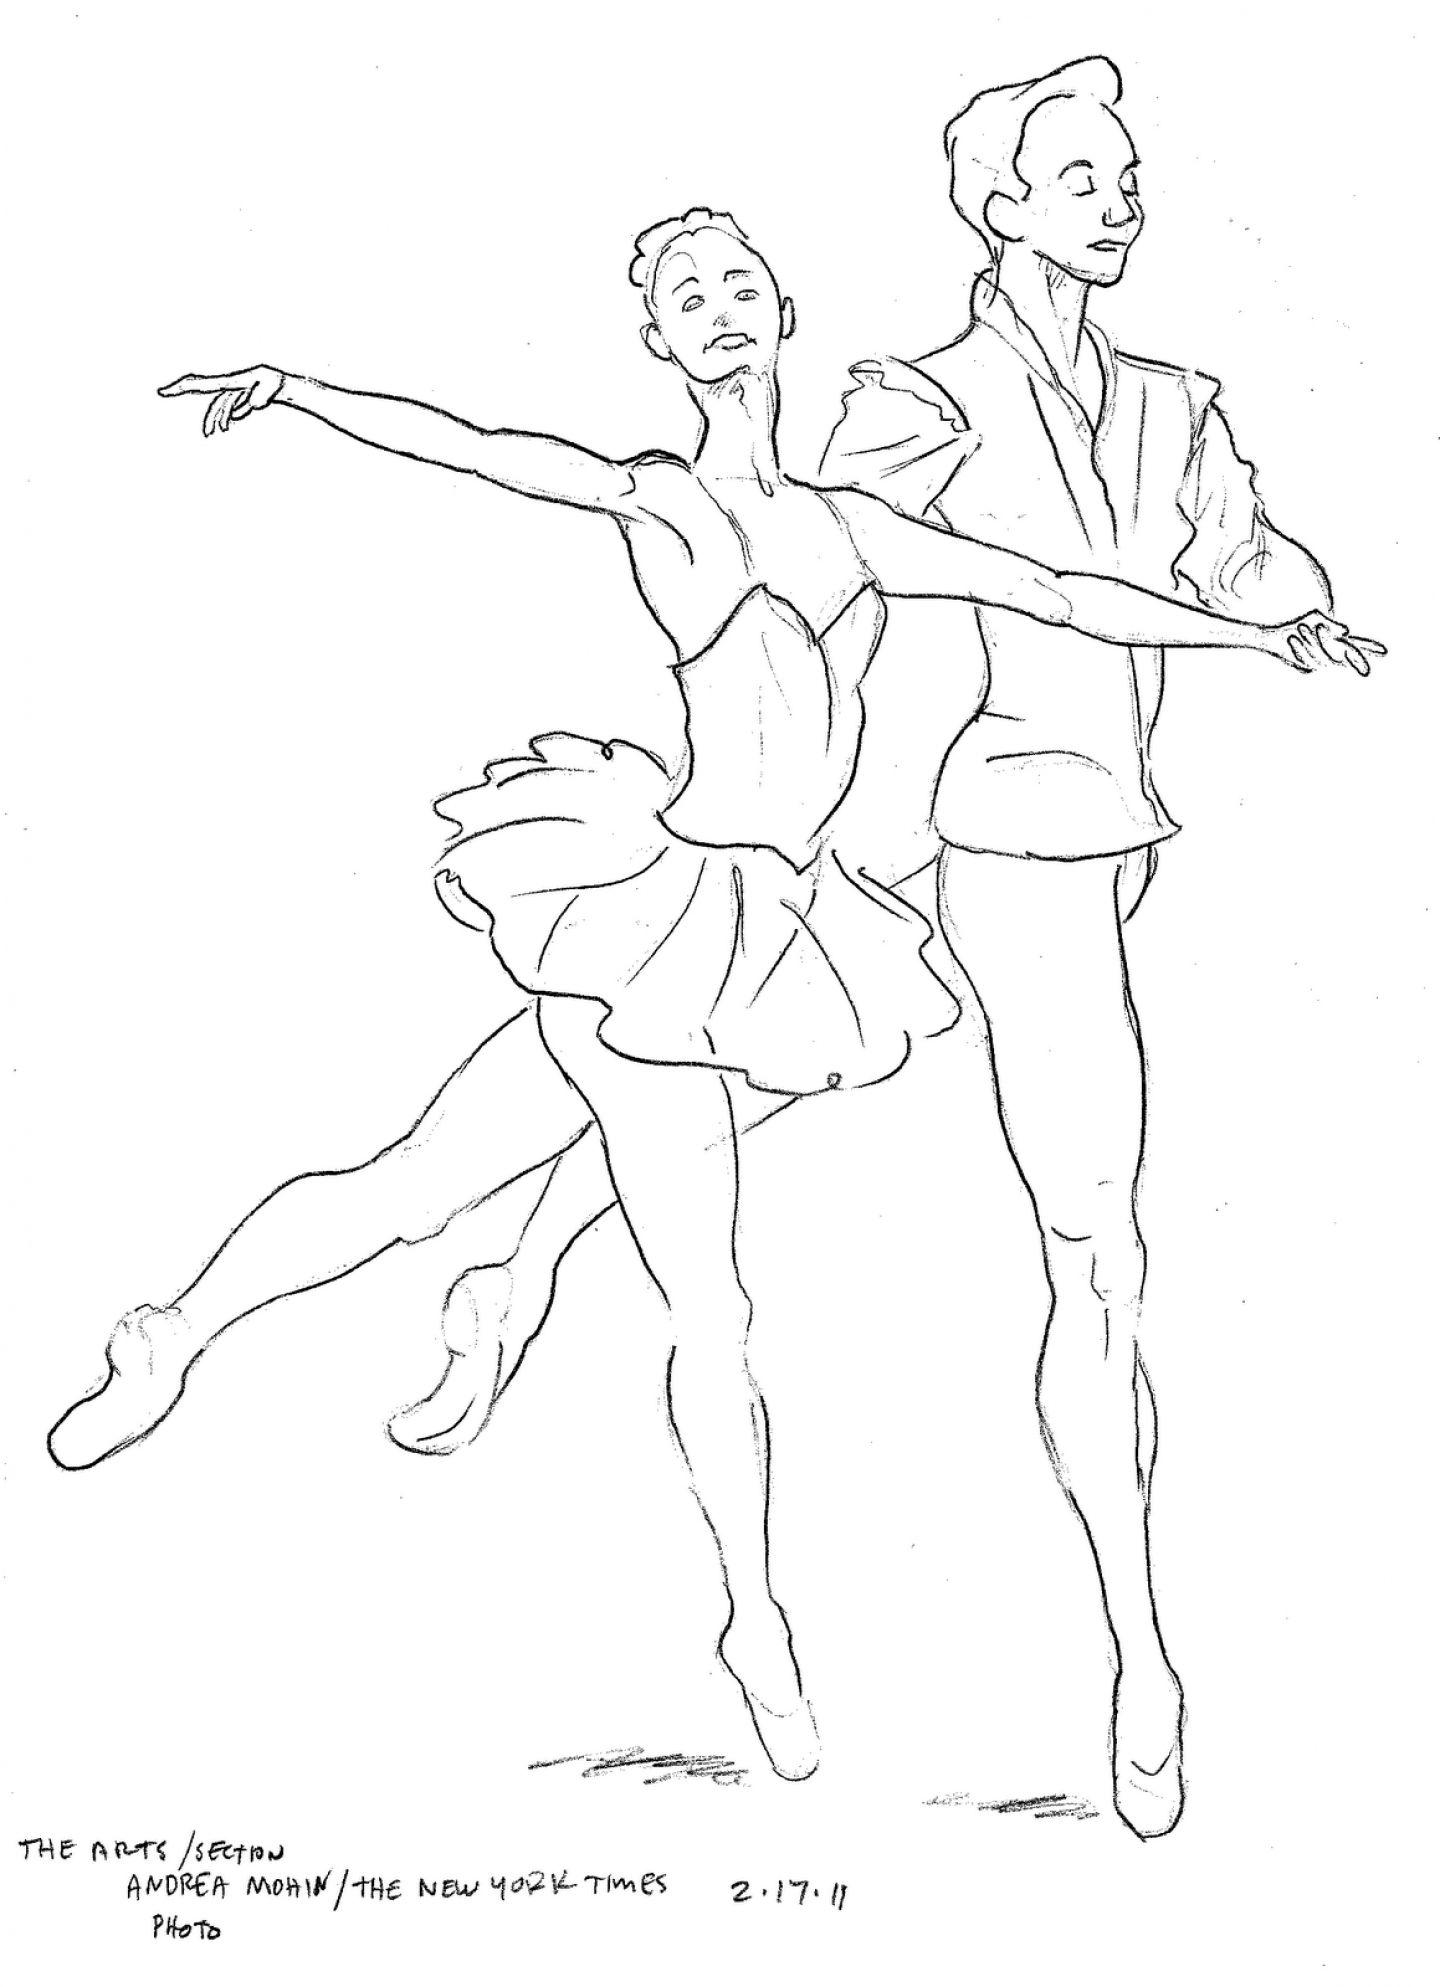 ballet dancer coloring pages pictures imagixs httpwwwcoloringoutlinecom - Free Ballet Coloring Pages 2